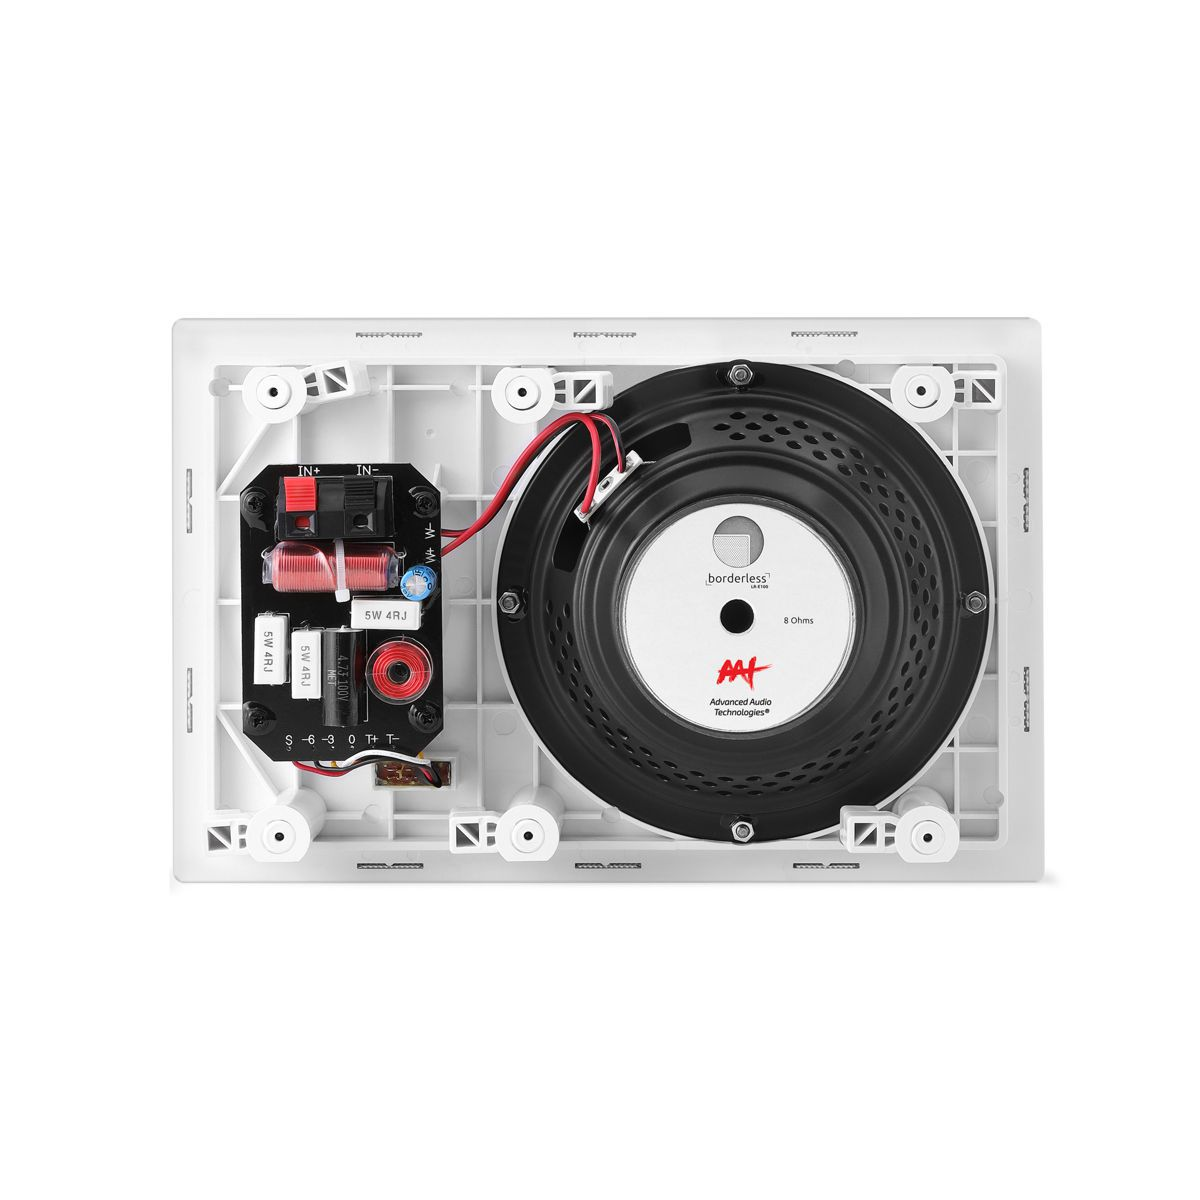 Kit 7.0 Caixa de Embutir no Gesso LCR-A100 + LR-E100 AAT